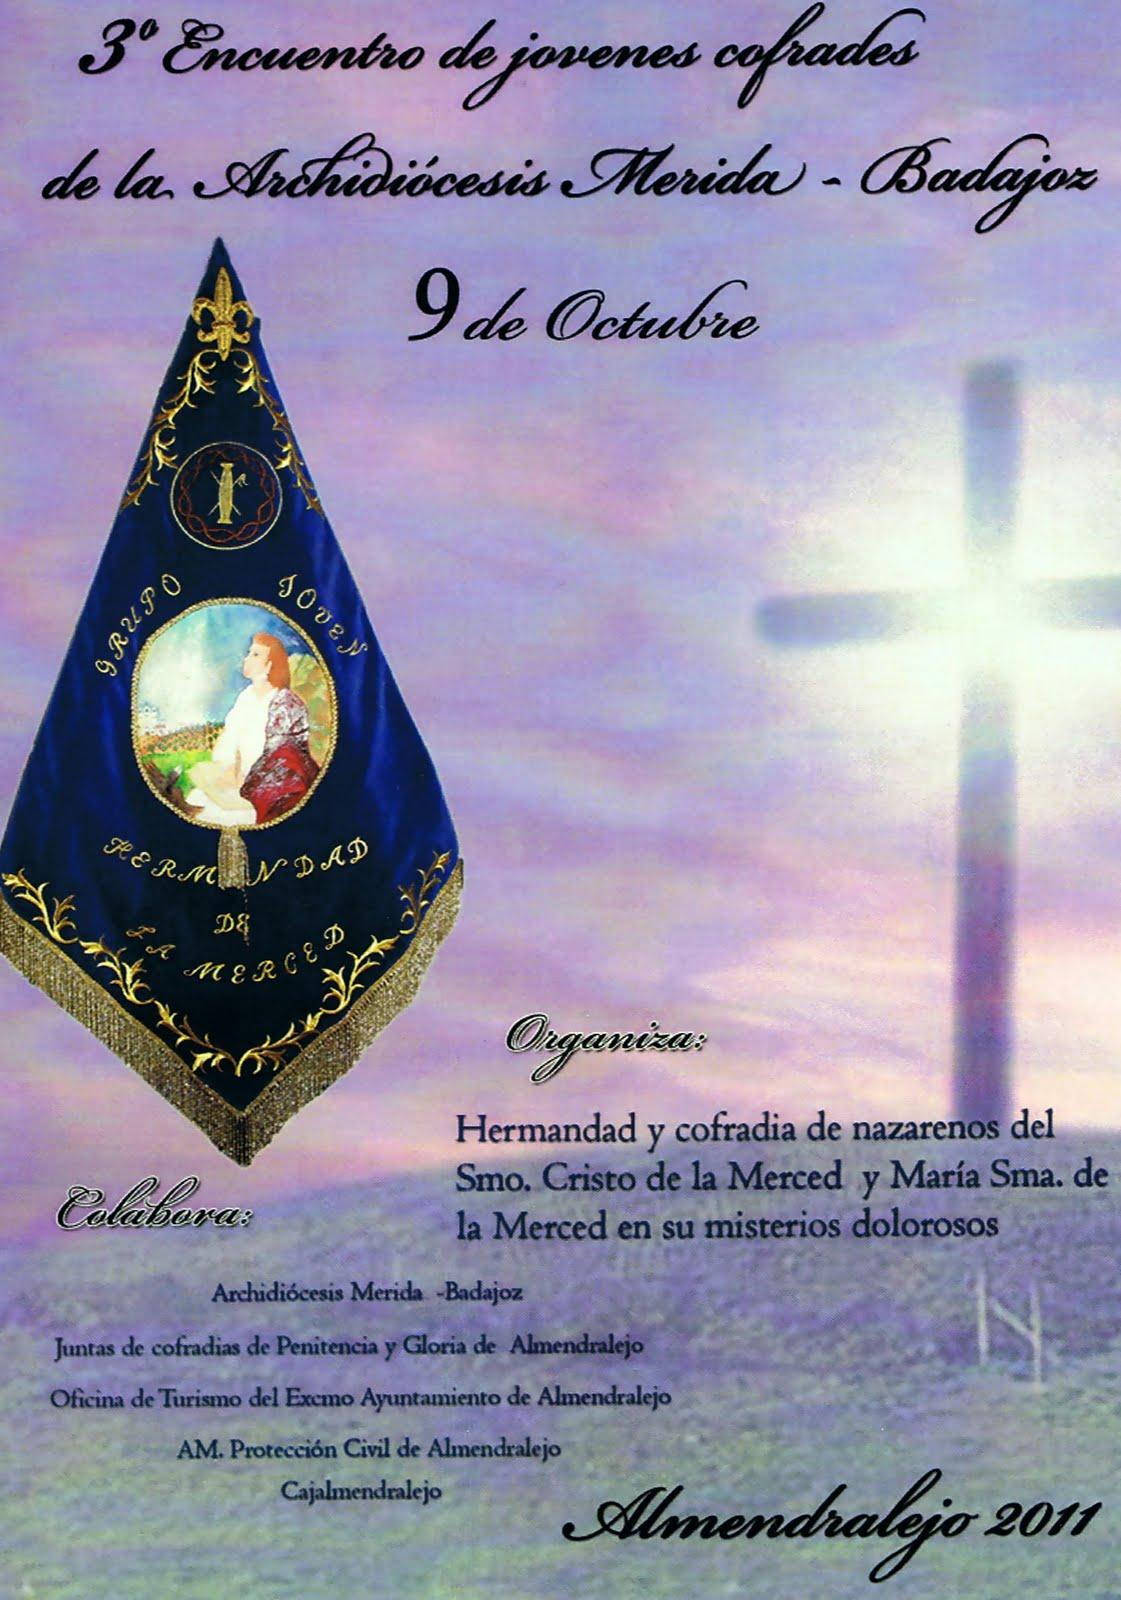 Cofradia de la santa vera cruz badajoz 3 encuentro de for Oficina de turismo de merida